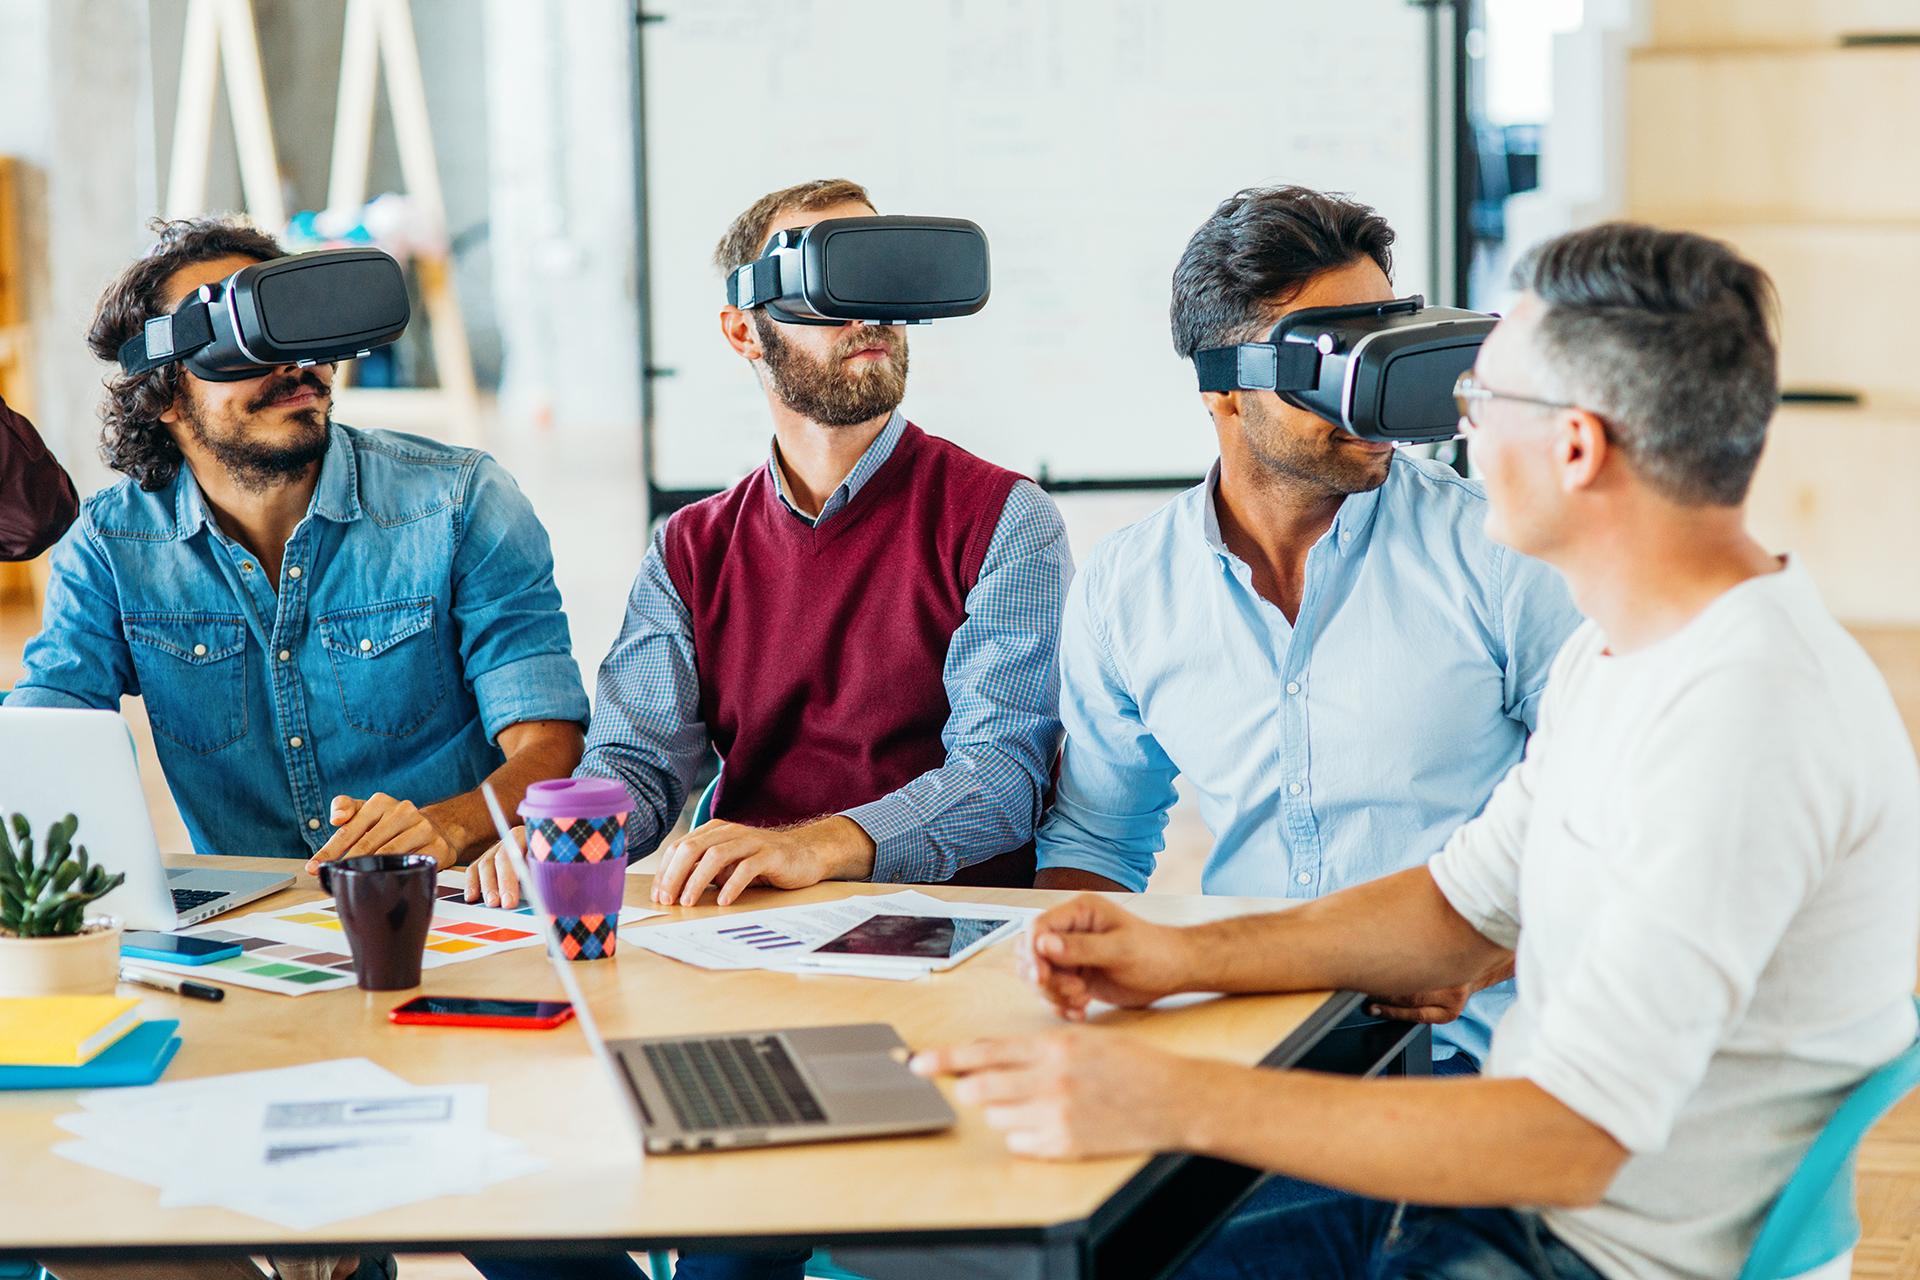 A Guide to Managing Virtual Board Meetings